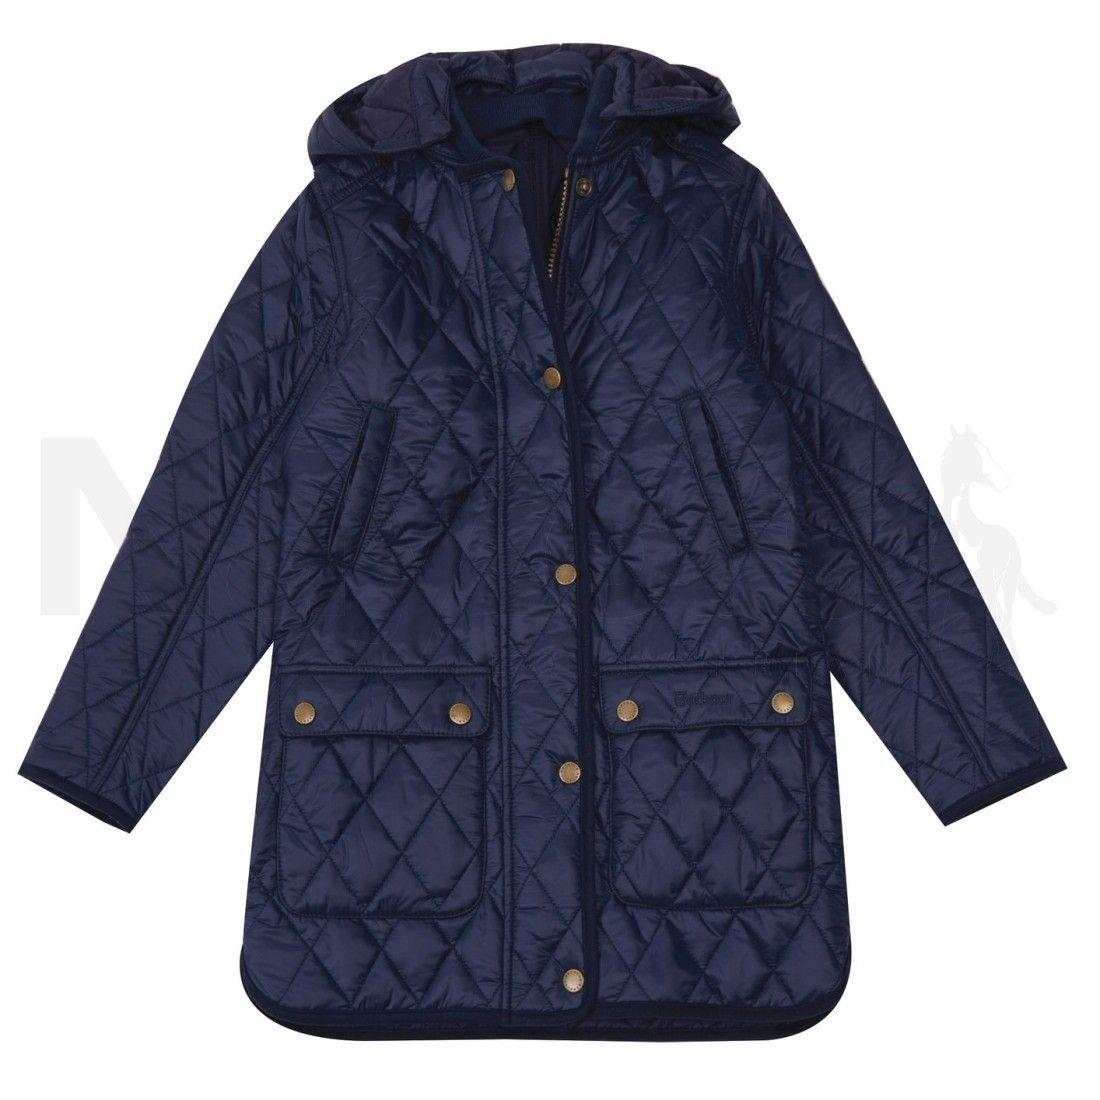 d8b16132 Barbour Girls Combe Quilt Jacket Navy | Barbour A/W 2017 | Pinterest ...